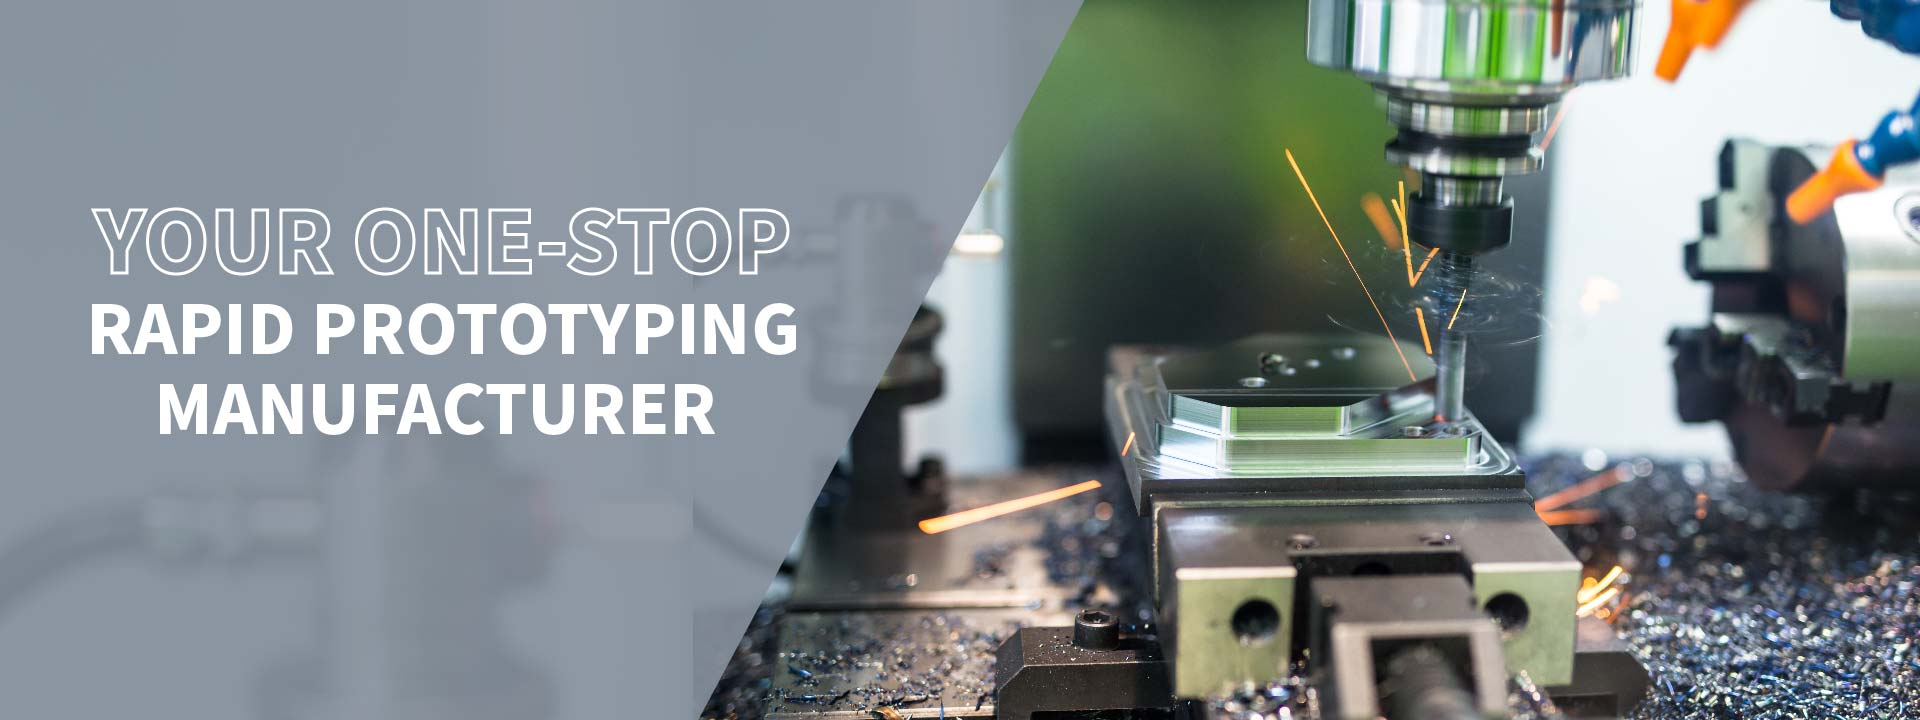 Rapid-prototyping-banner